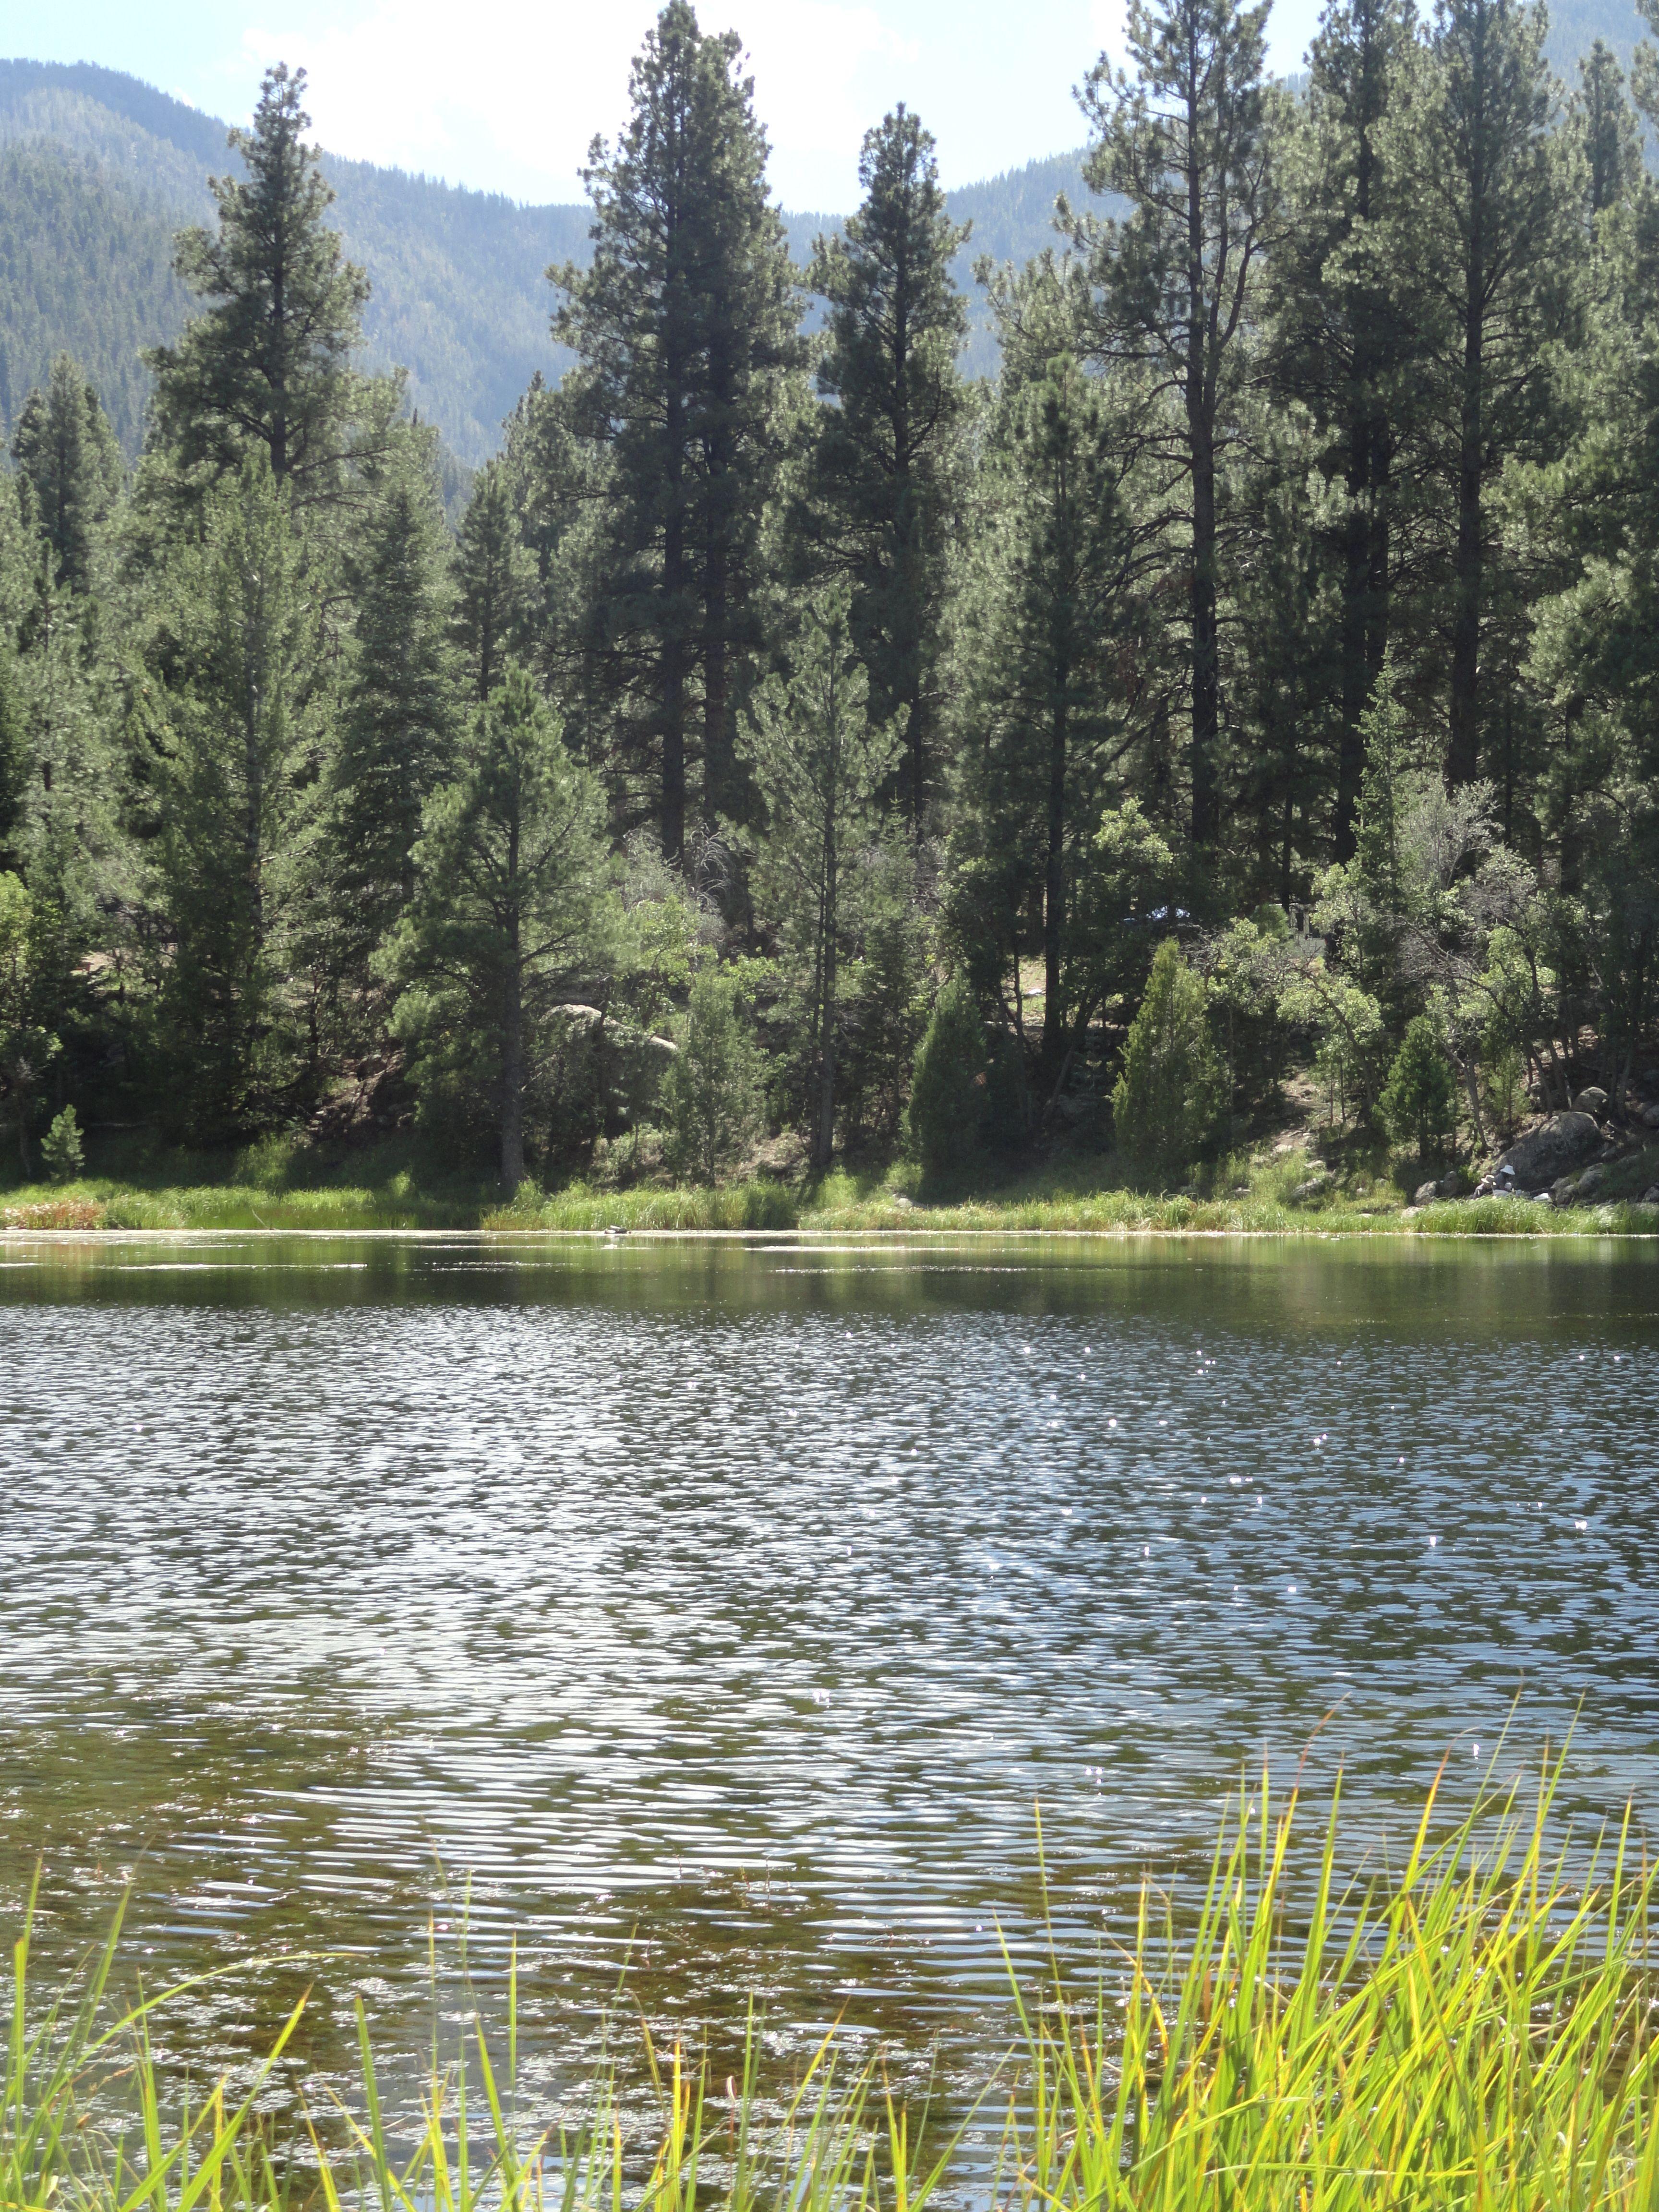 Pine Valley, Utah | Utah camping, Pine valley utah, Pine ...